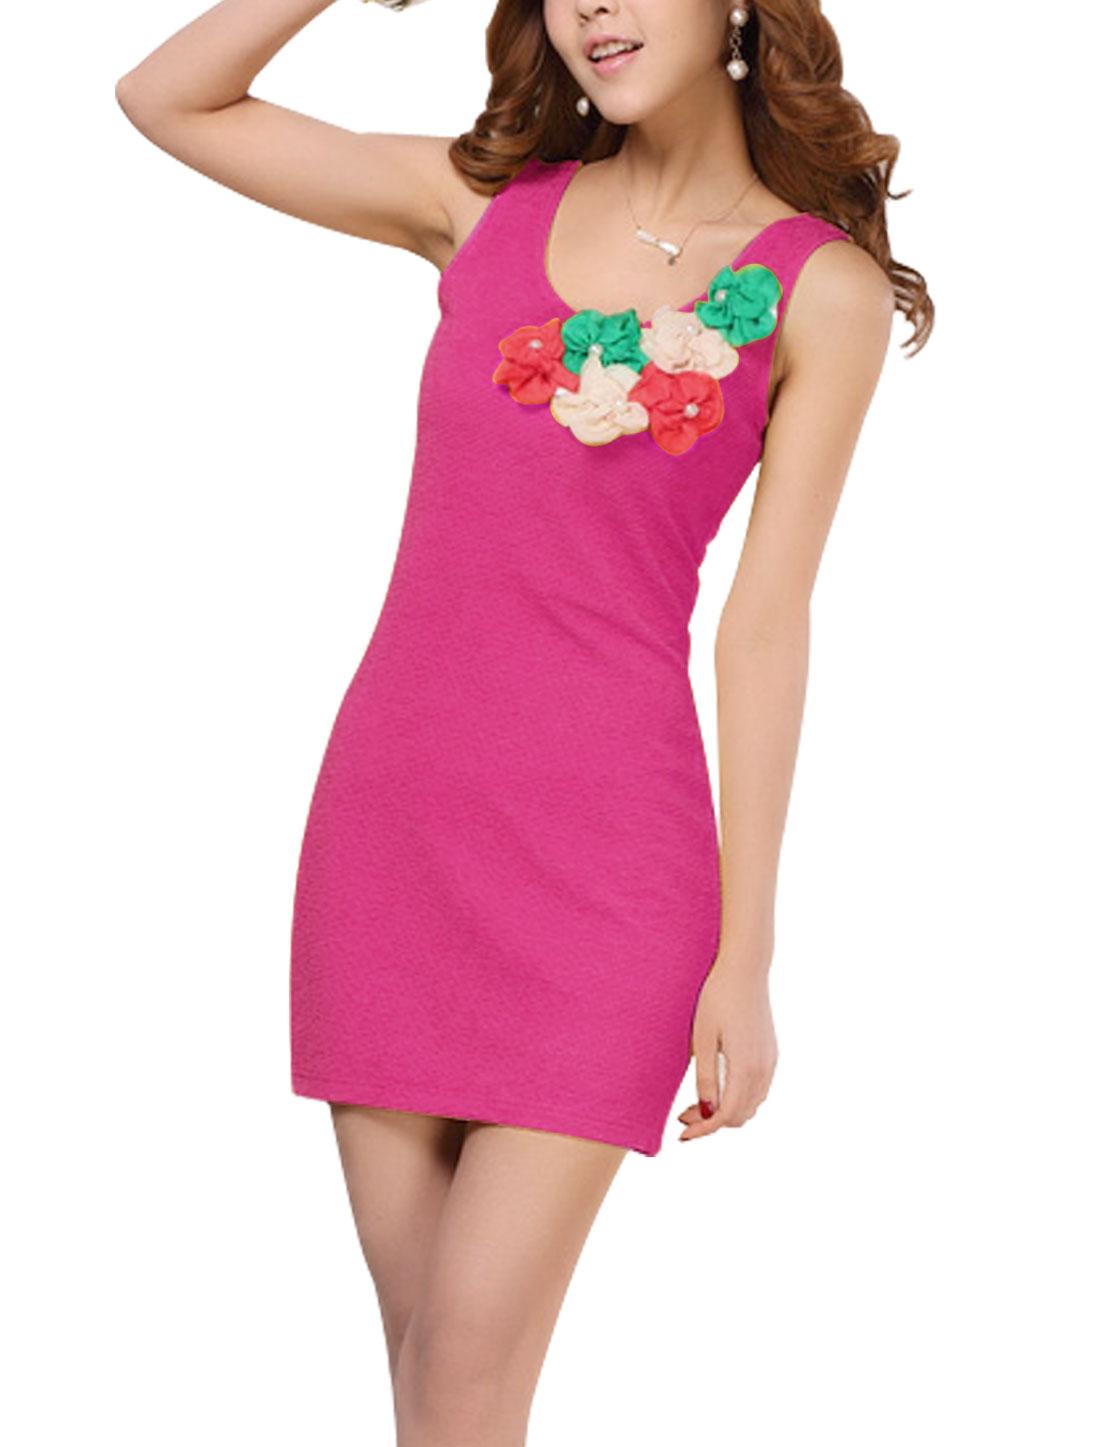 Lady Sleeveless Flower Decor Fake Pearls Decor Dress Fuchsia M